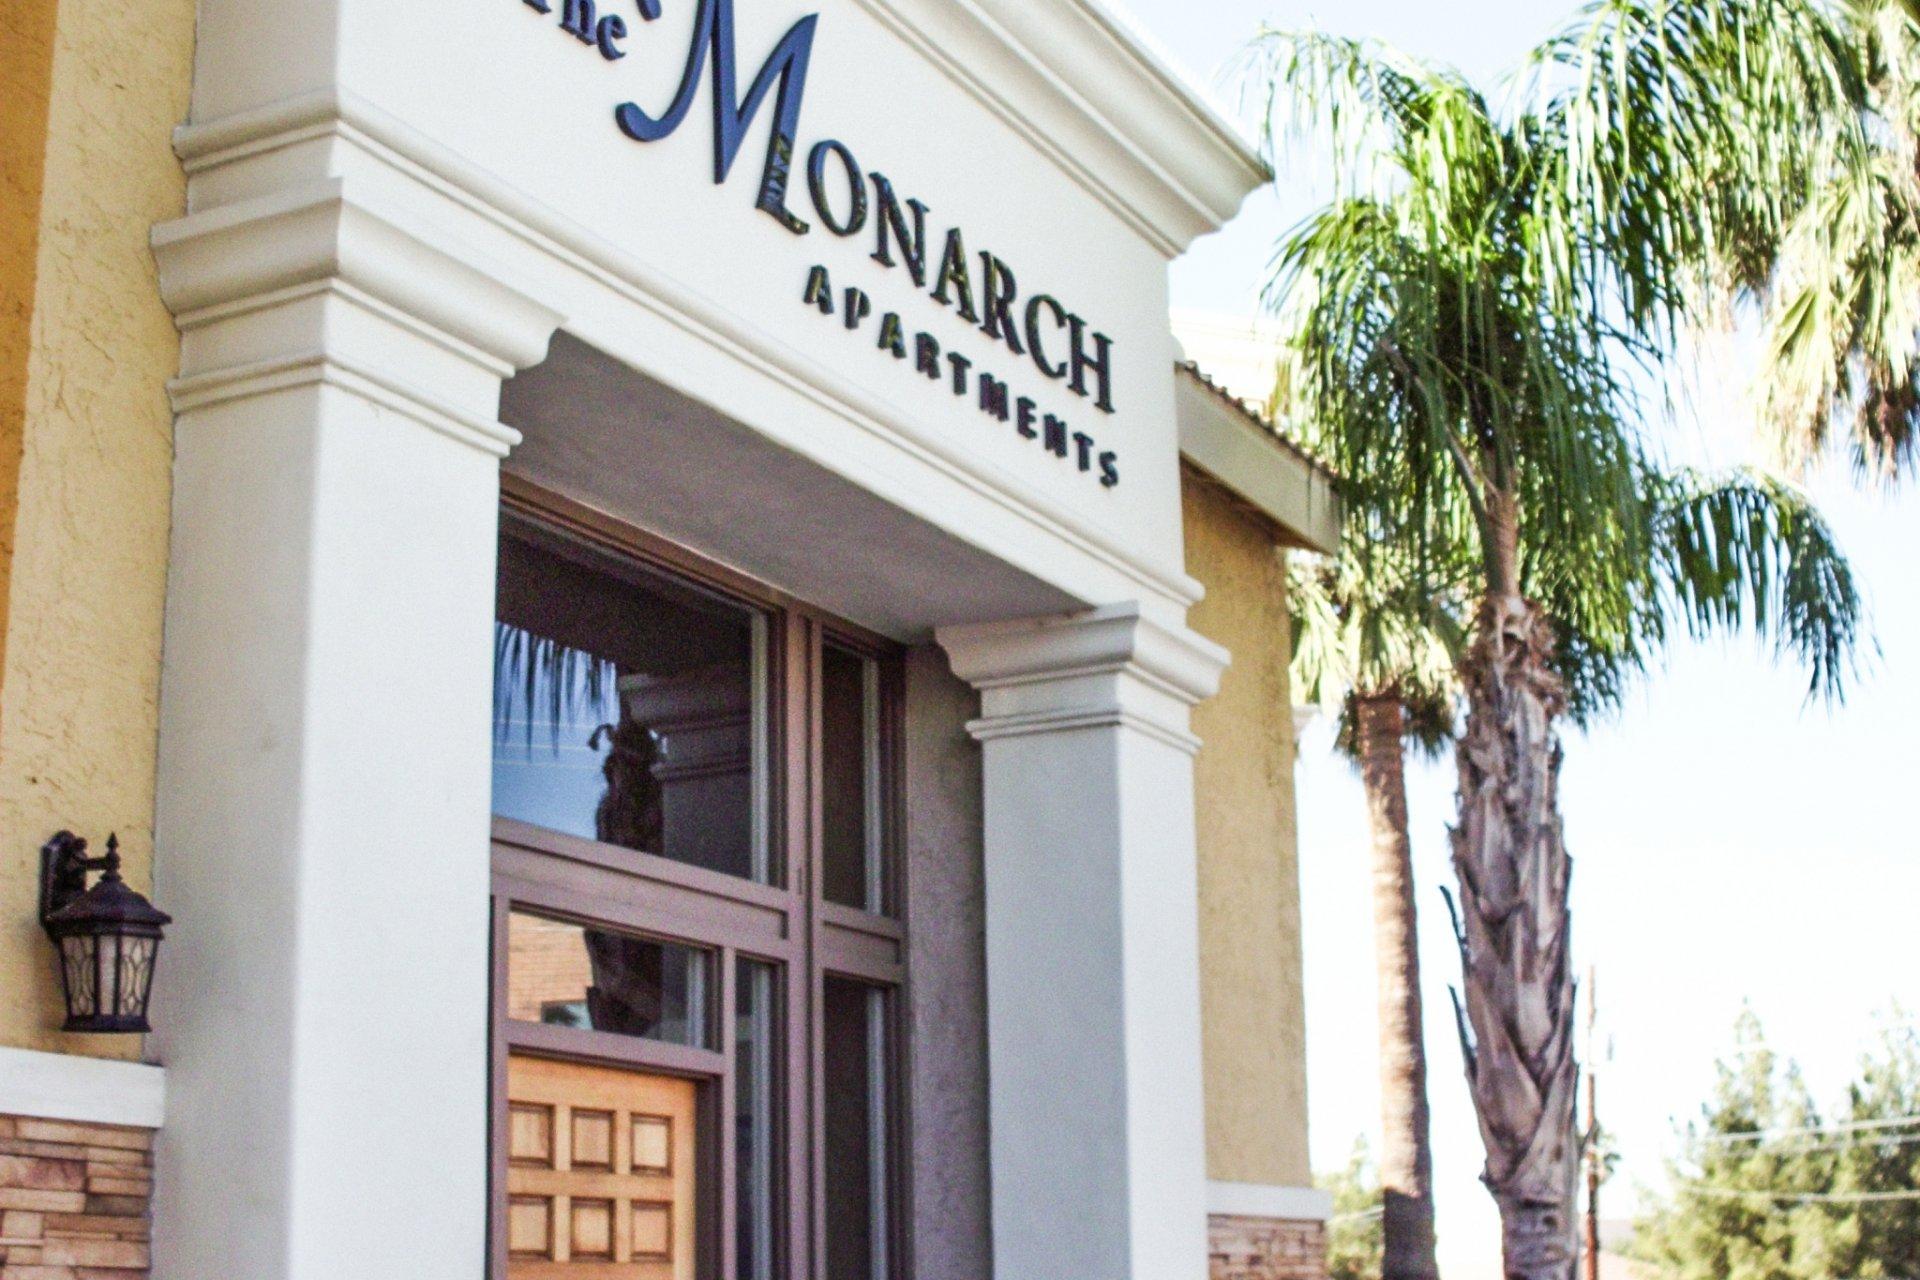 The Monarch Apartments Phoenix, AZ signage